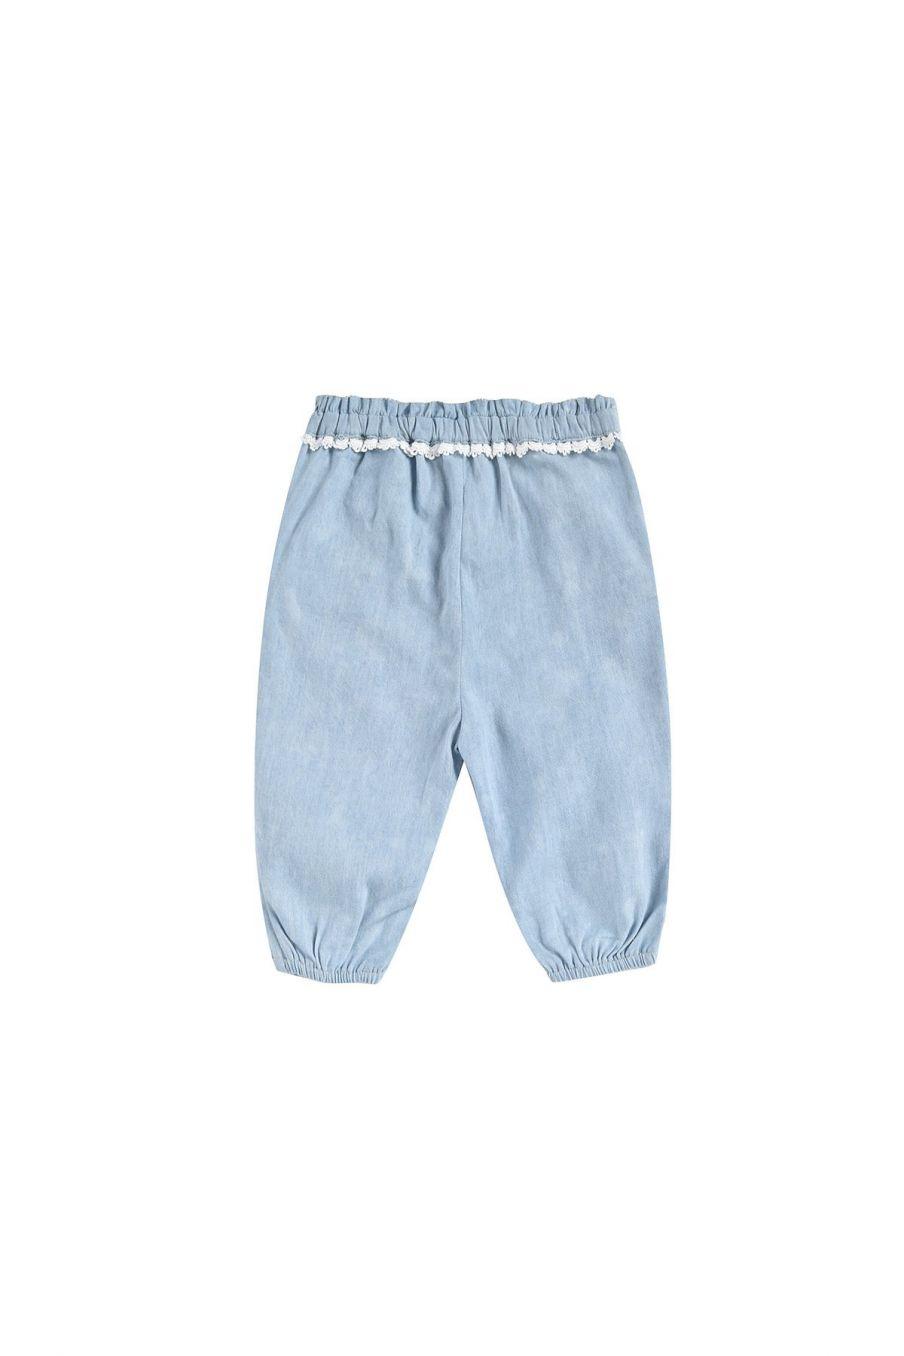 boheme chic vintage pantalon bébé fille solena chambray